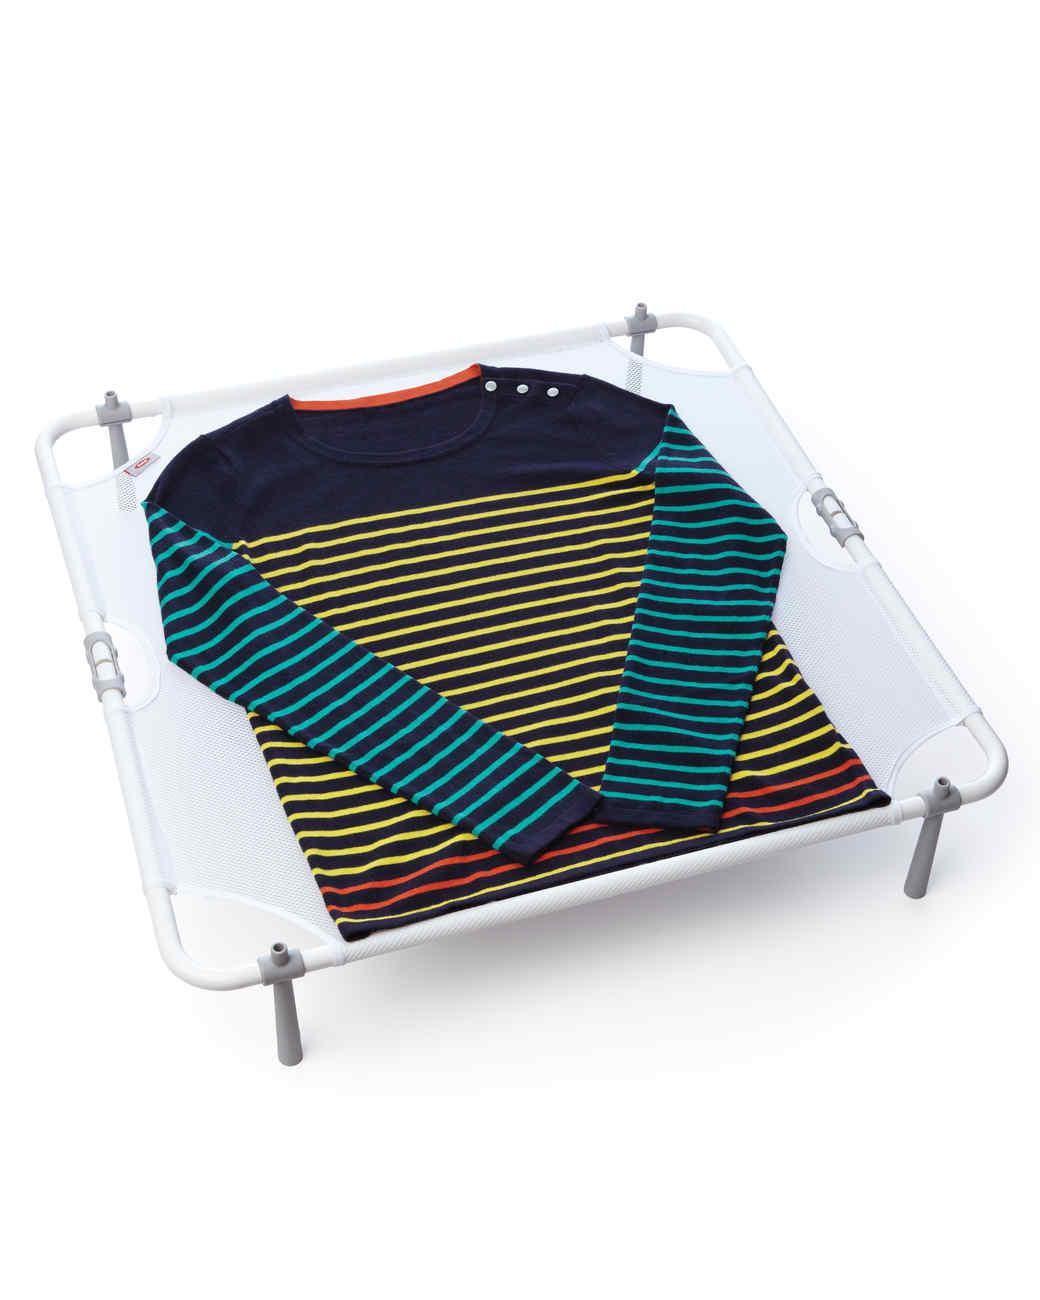 sweater-drying-rack2-049-md109483.jpg